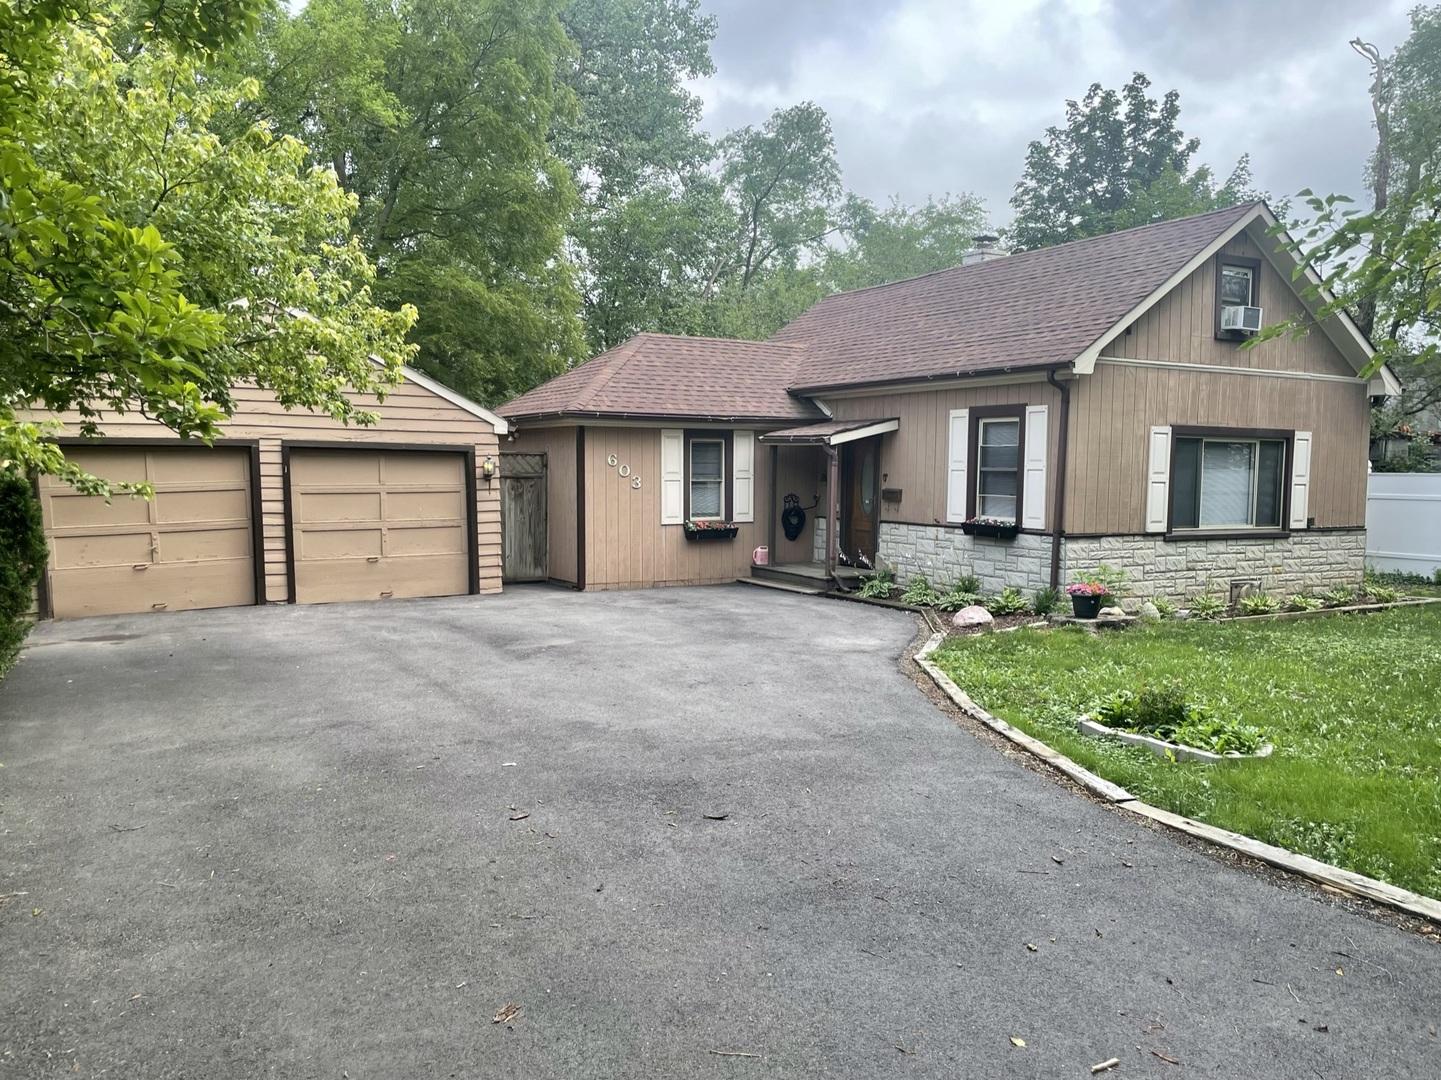 603 Greenwood Road, Glenview, Il 60025